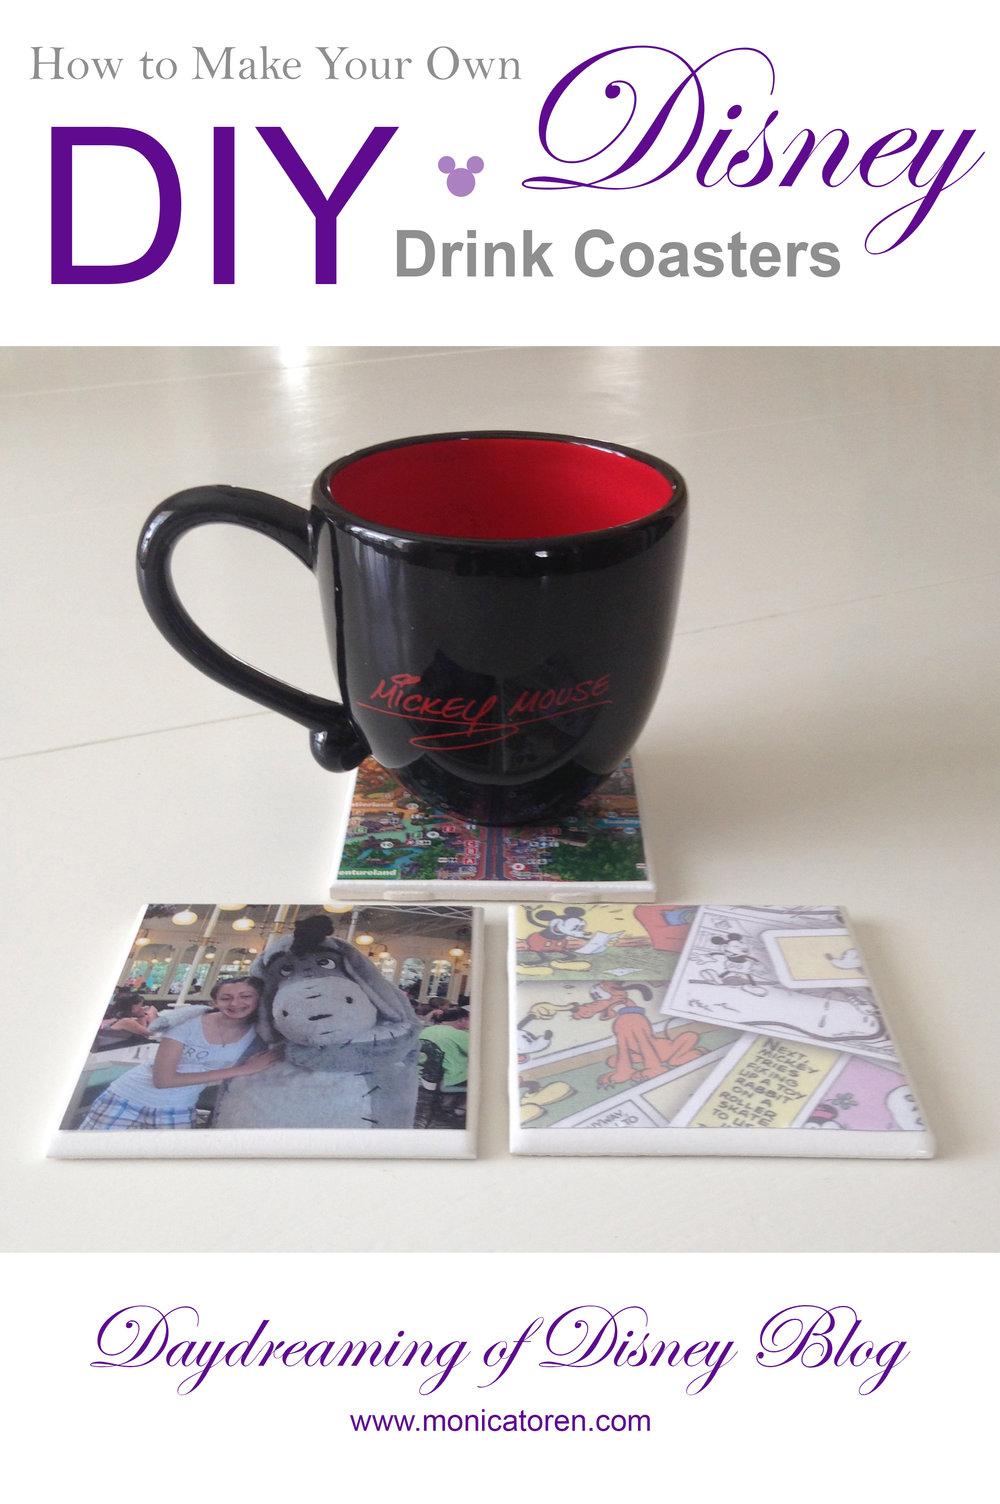 Daydreaming of Disney Blog - How to Make Your Own DIY Disney Drink Coasters - http://www.monicatoren.com #diy #disney #tutorial #disneycraft